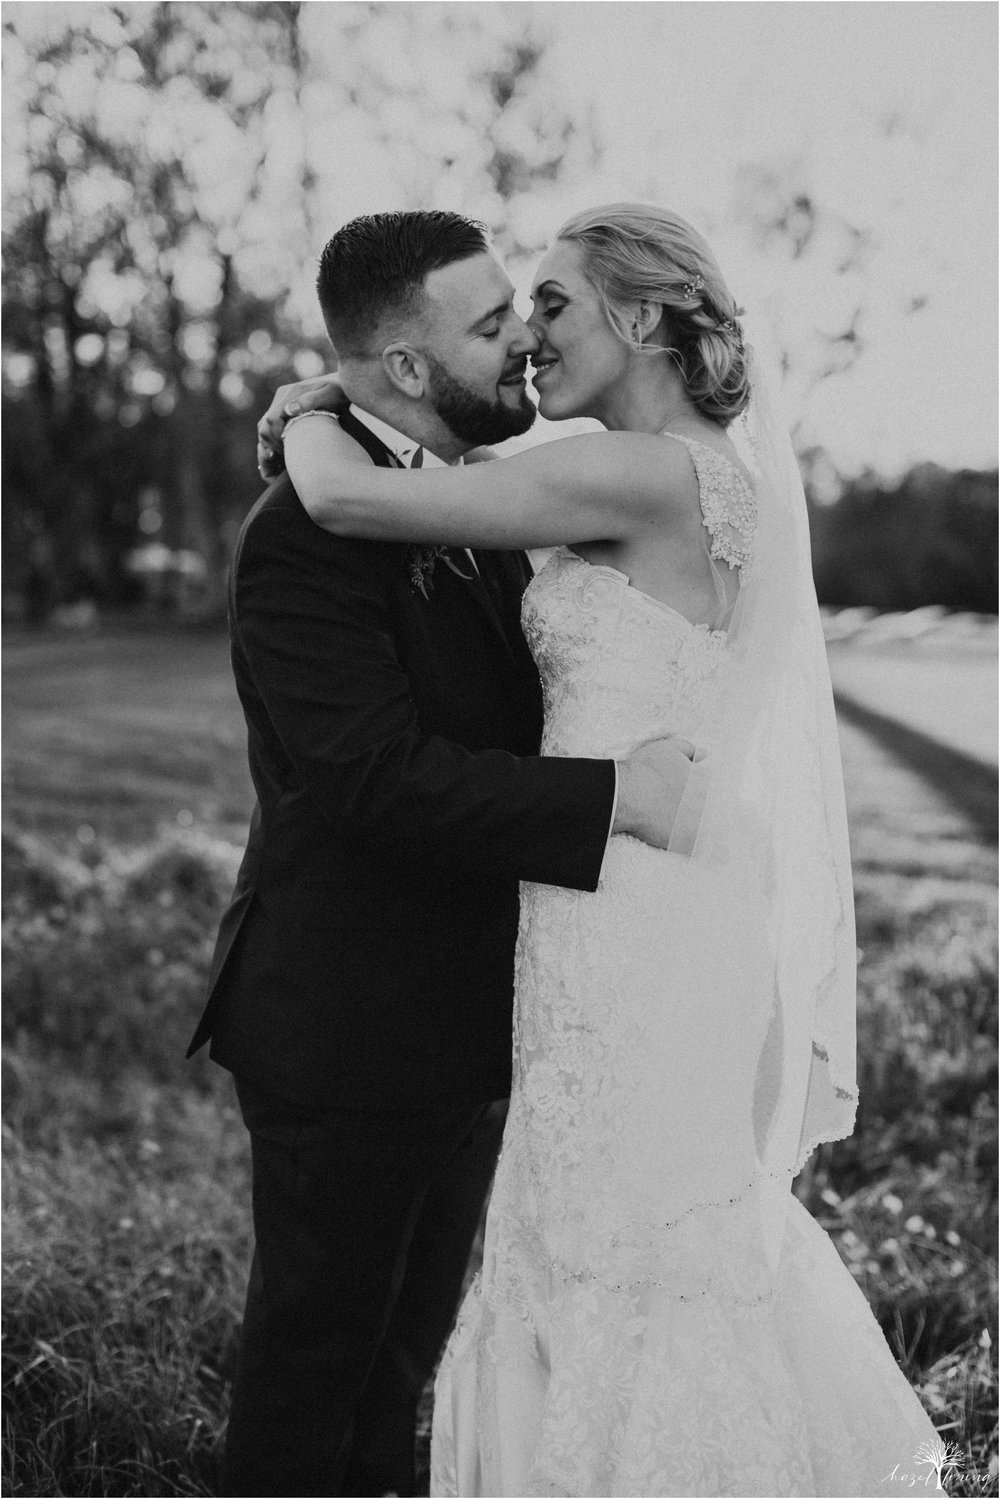 briana-krans-greg-johnston-farm-bakery-and-events-fall-wedding_0120.jpg